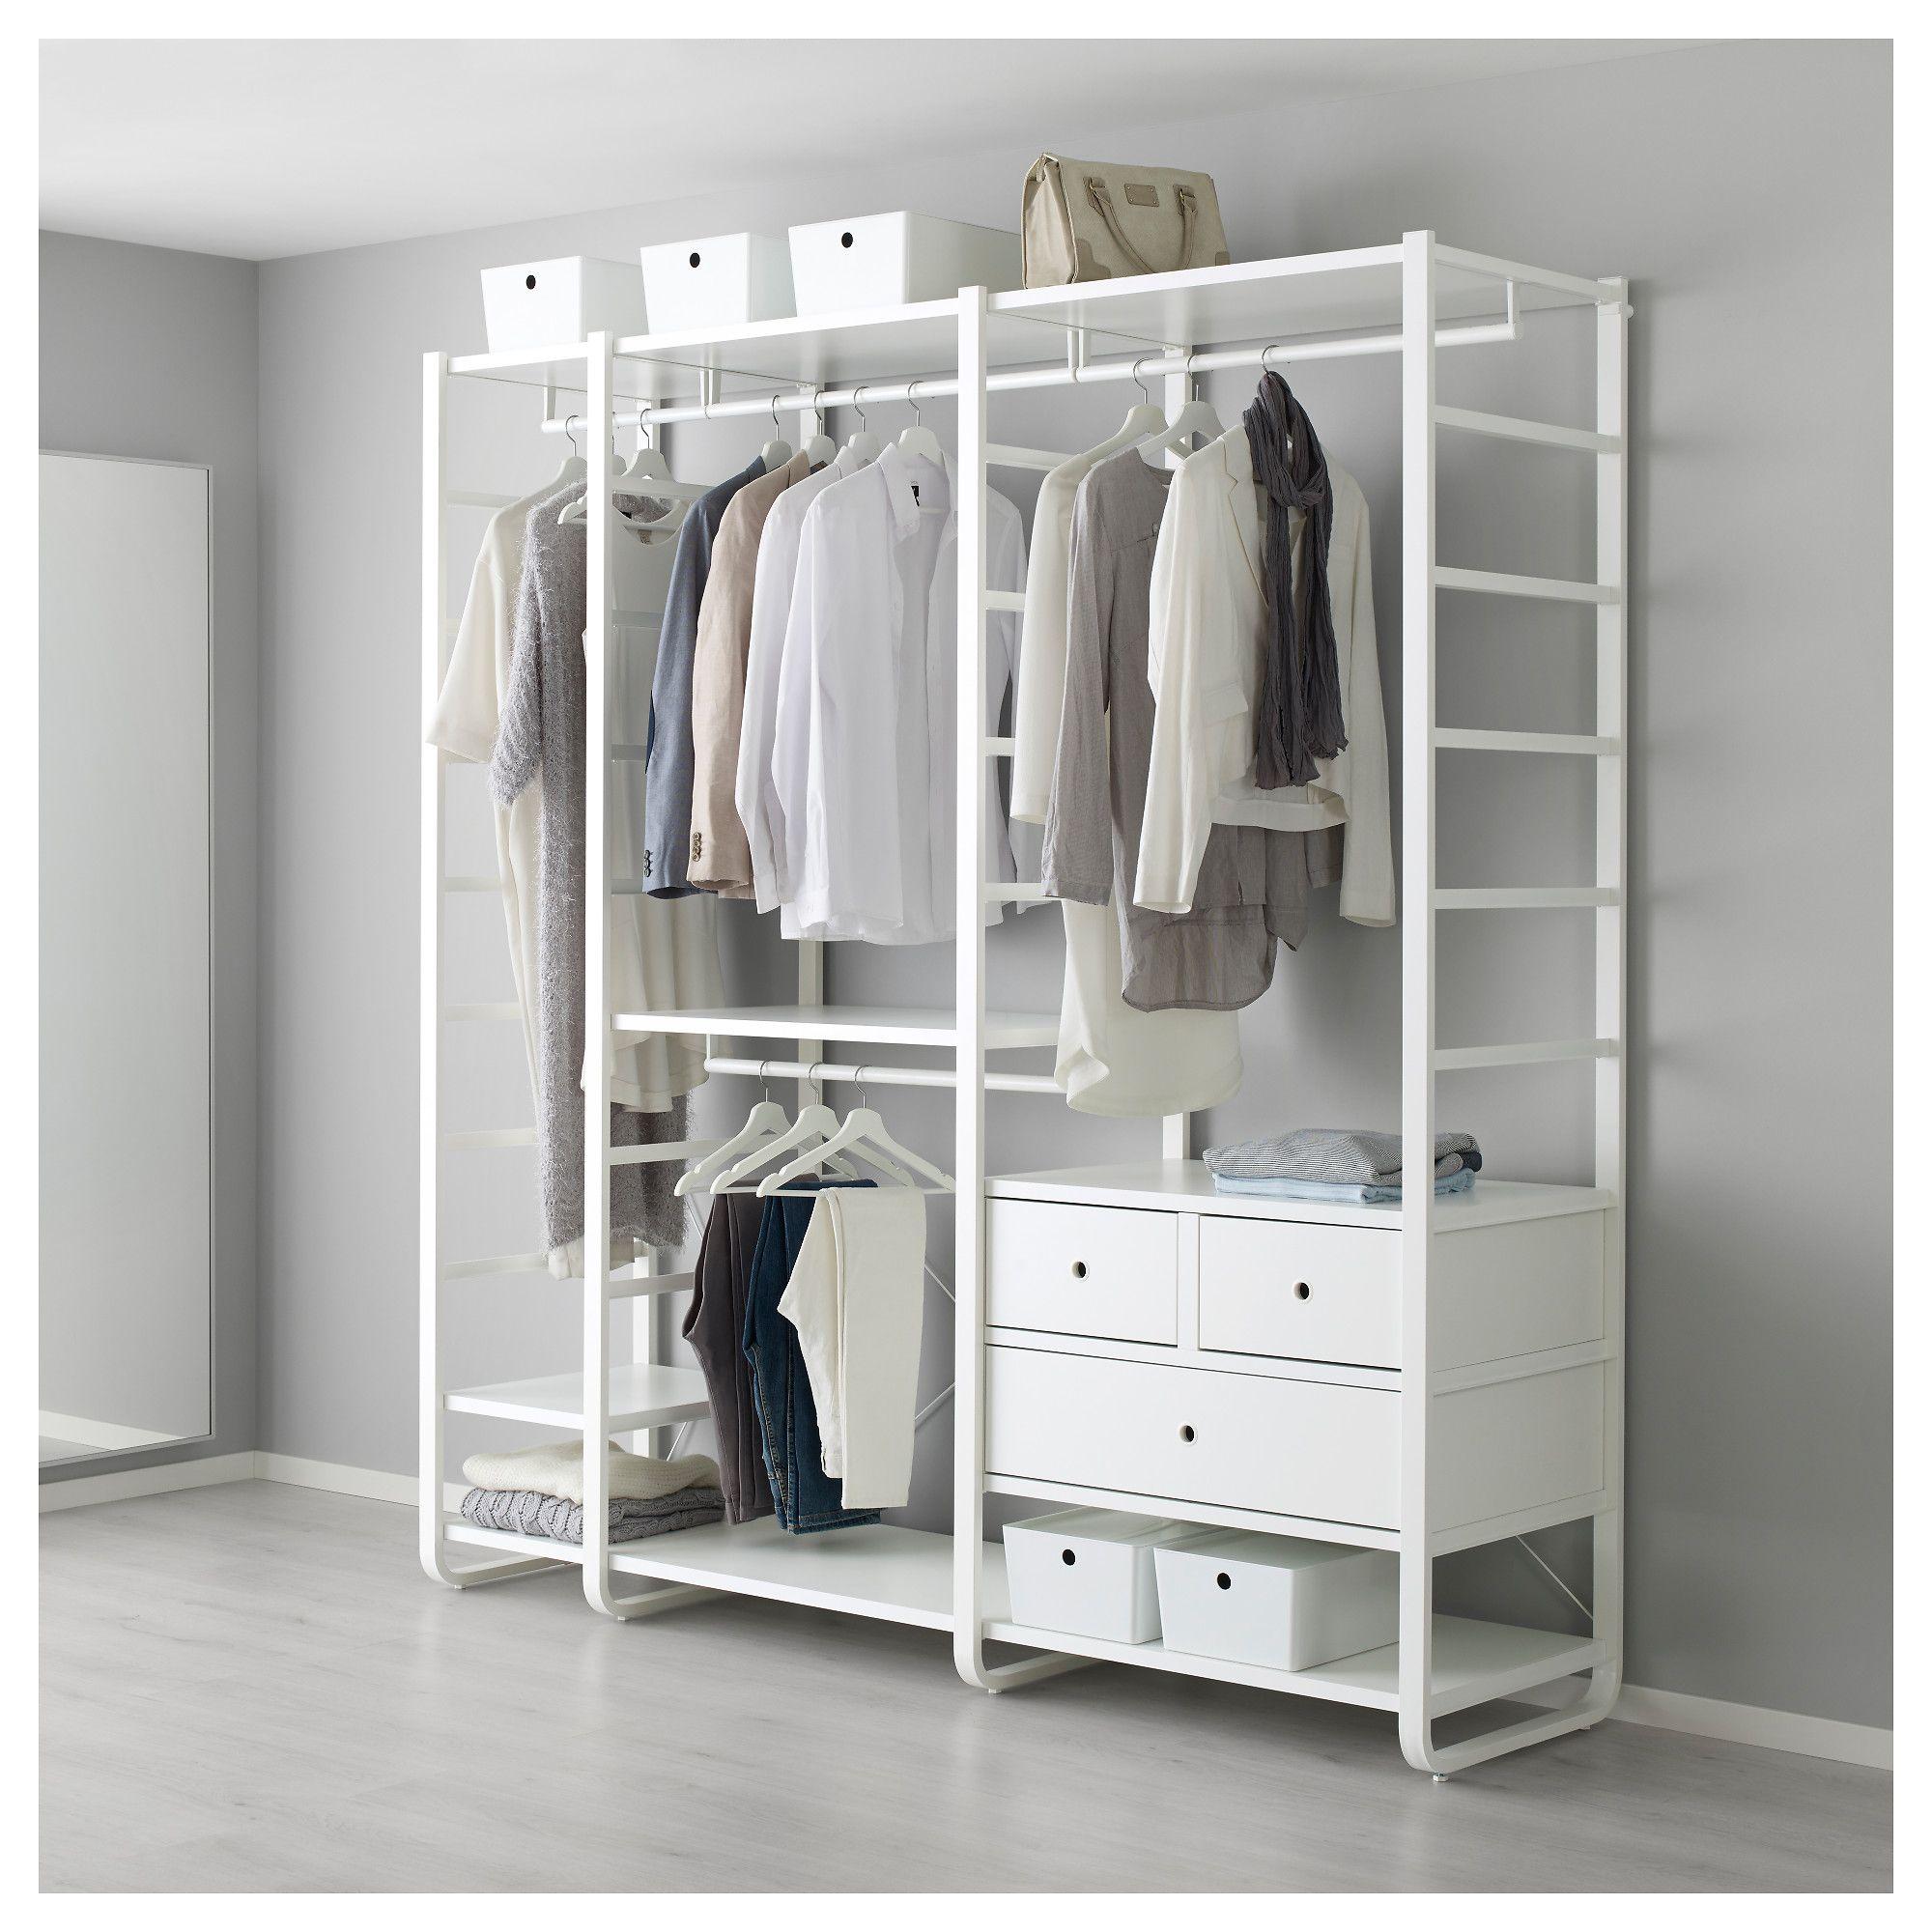 ELVARLI 3 sections White IKEA   Open wardrobe, Ikea, Shelves